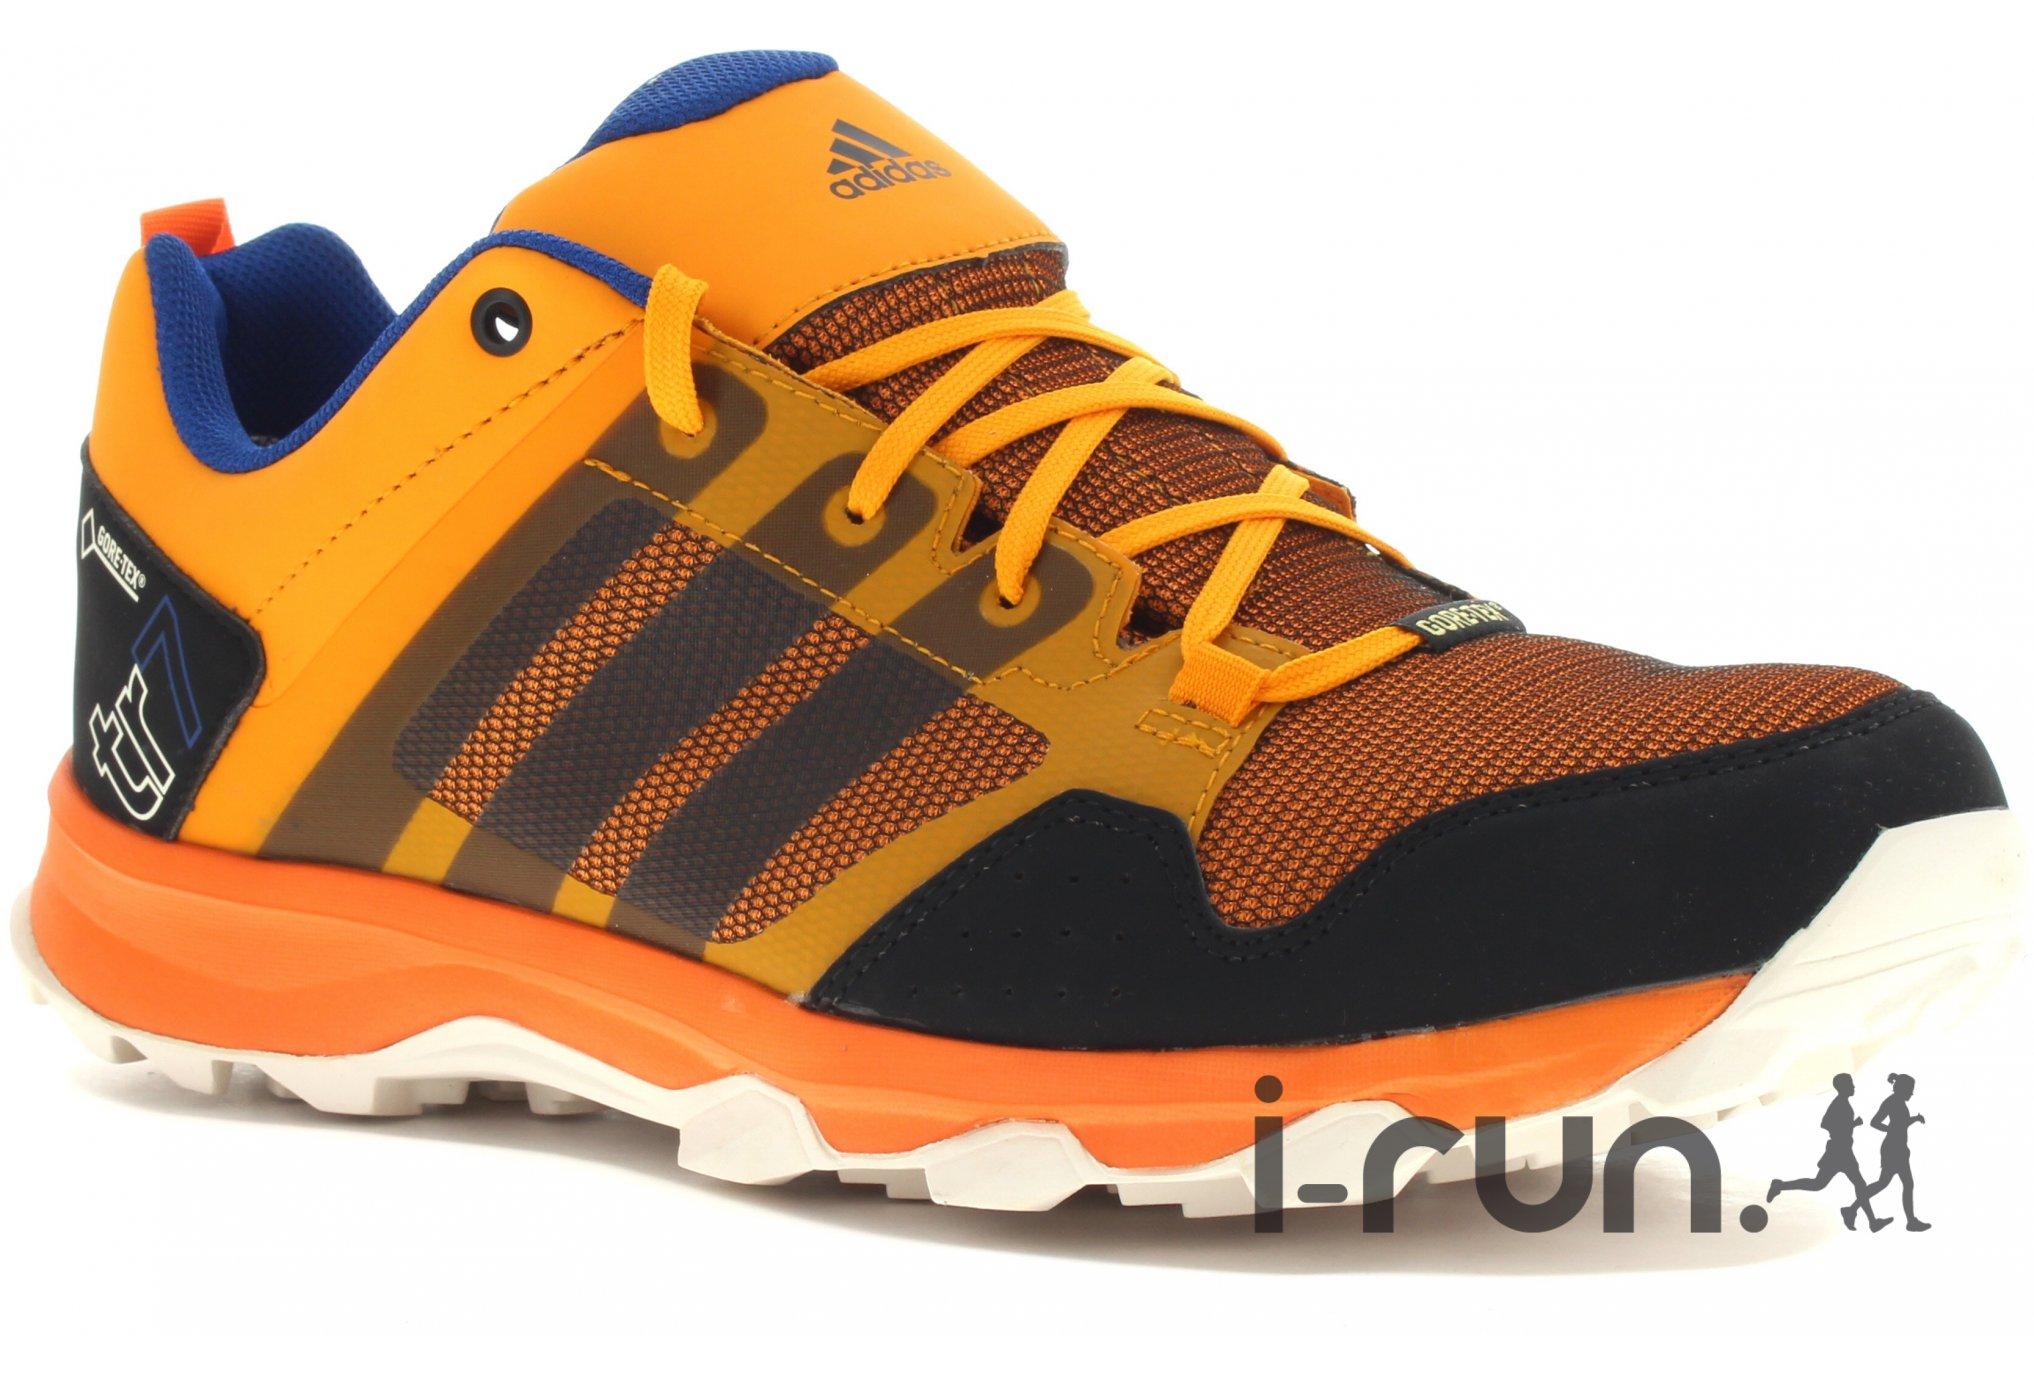 check out 8f35c 7ba0c chaussures adidas kanadia,adidas Kanadia 7 Tr Gtx,Chaussures de Sport  Femme,Gris Vista Grey